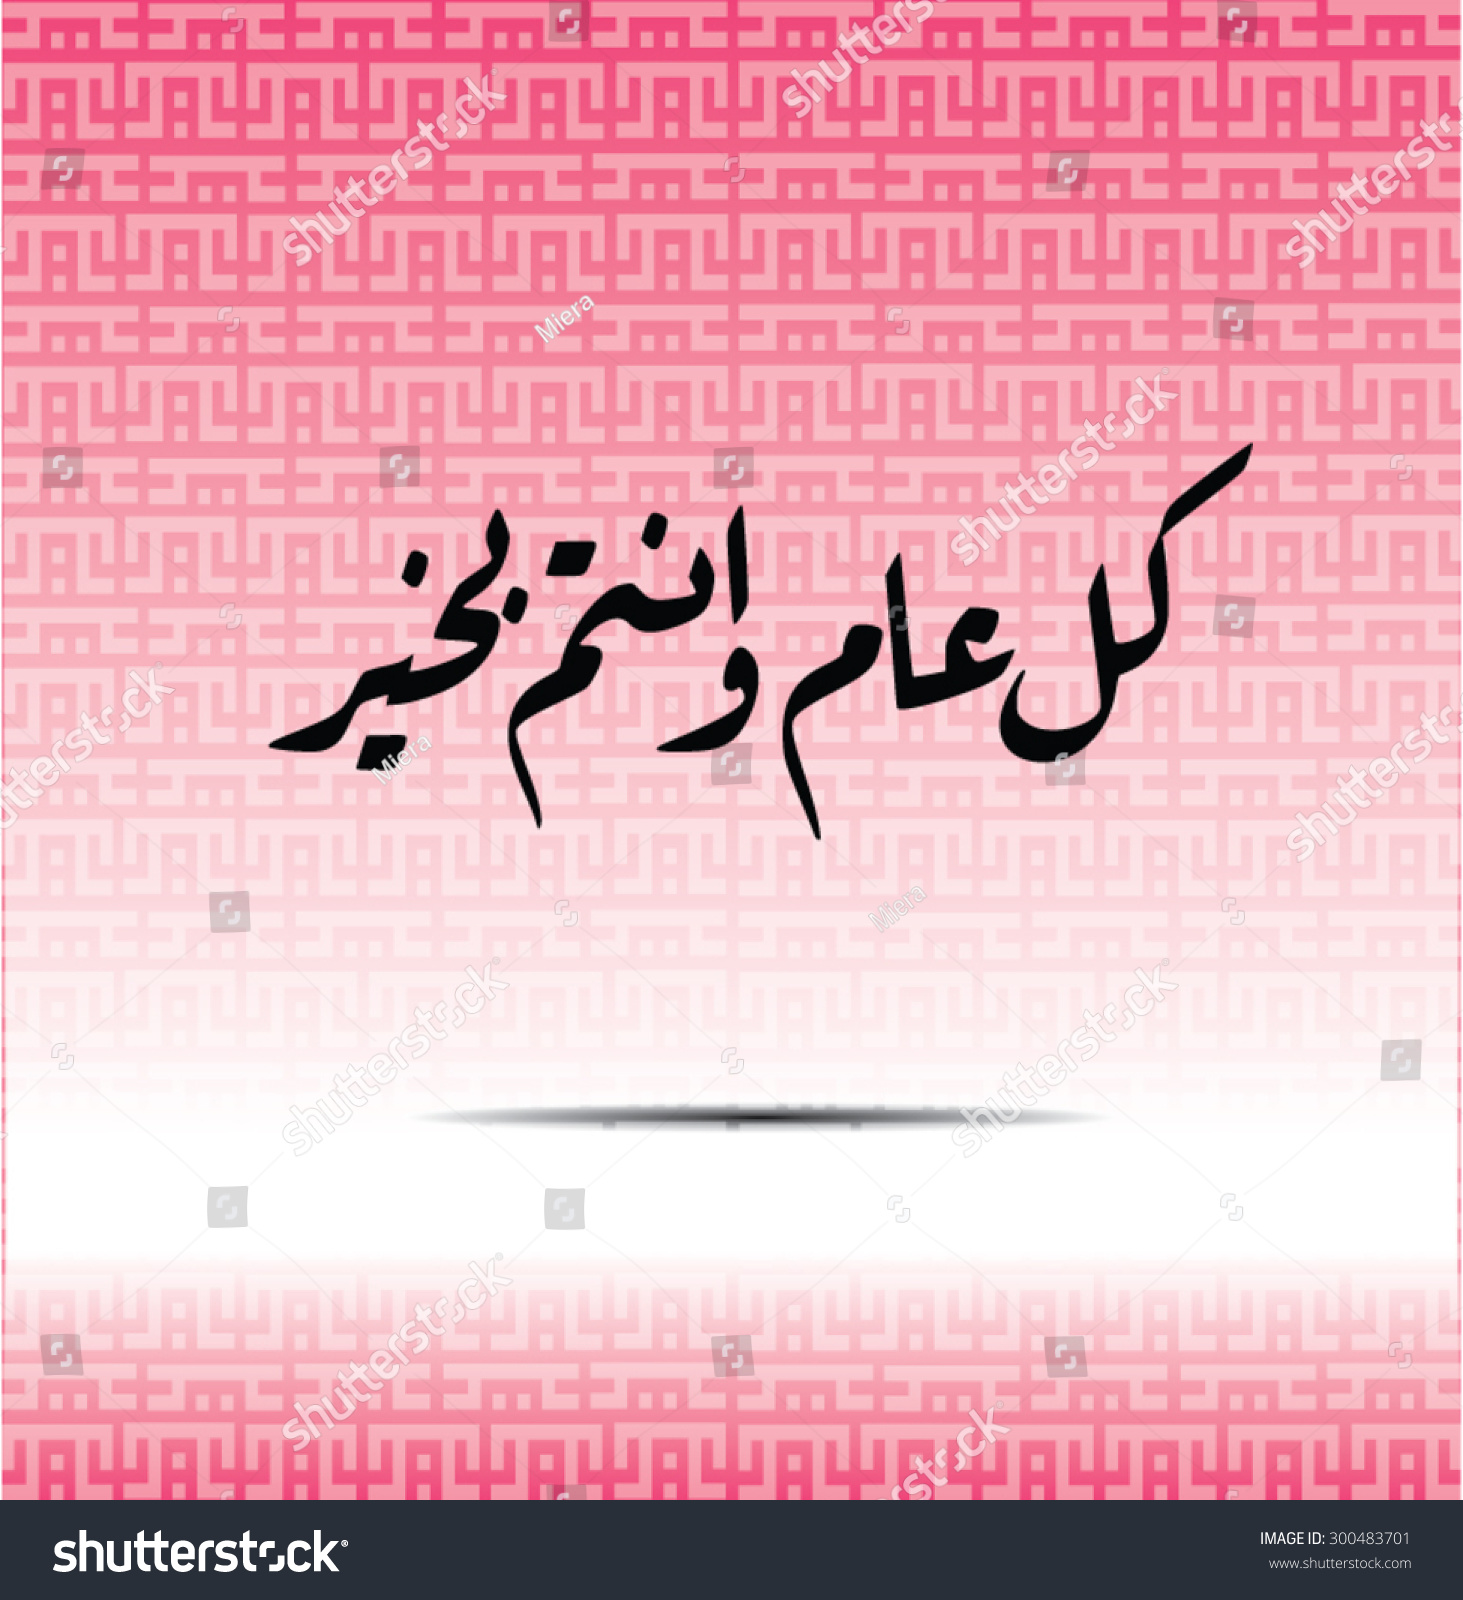 Eid greeting vector geometric ruqaa arabic stock vector 300483701 eid greeting vector in geometric ruqaa arabic calligraphy style translationmay you be well kristyandbryce Choice Image